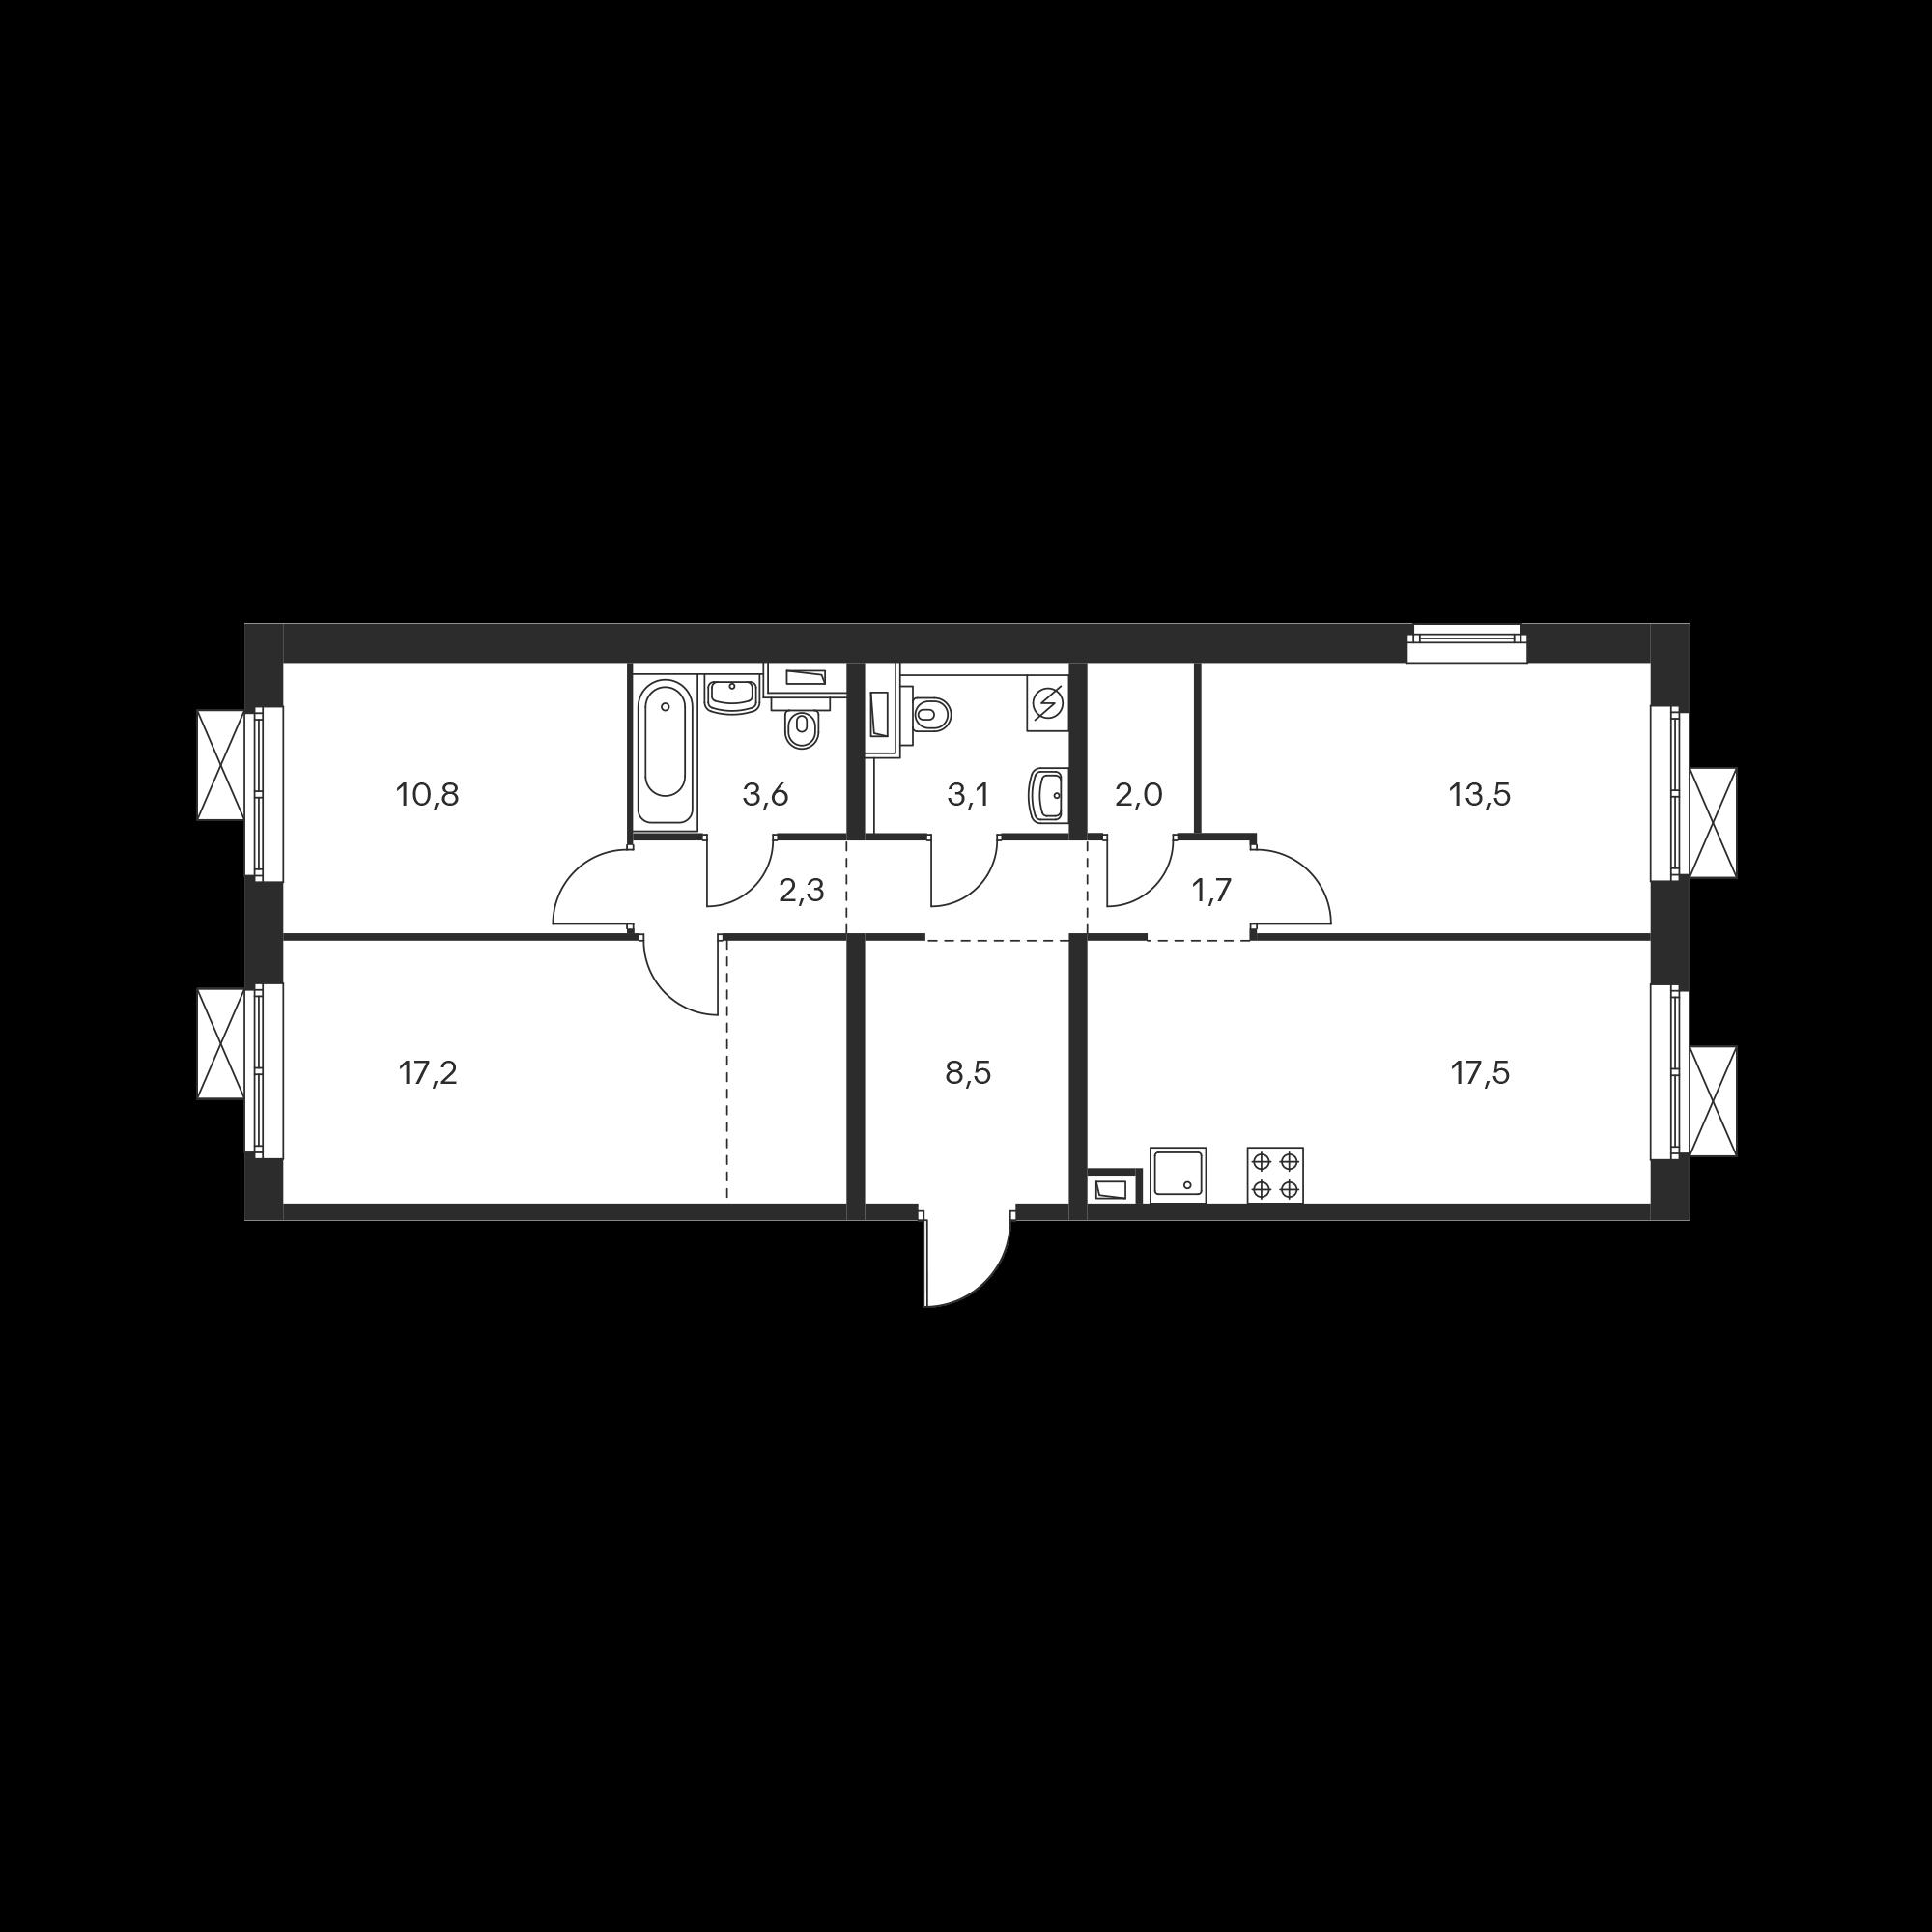 3KM16_6.0-3T